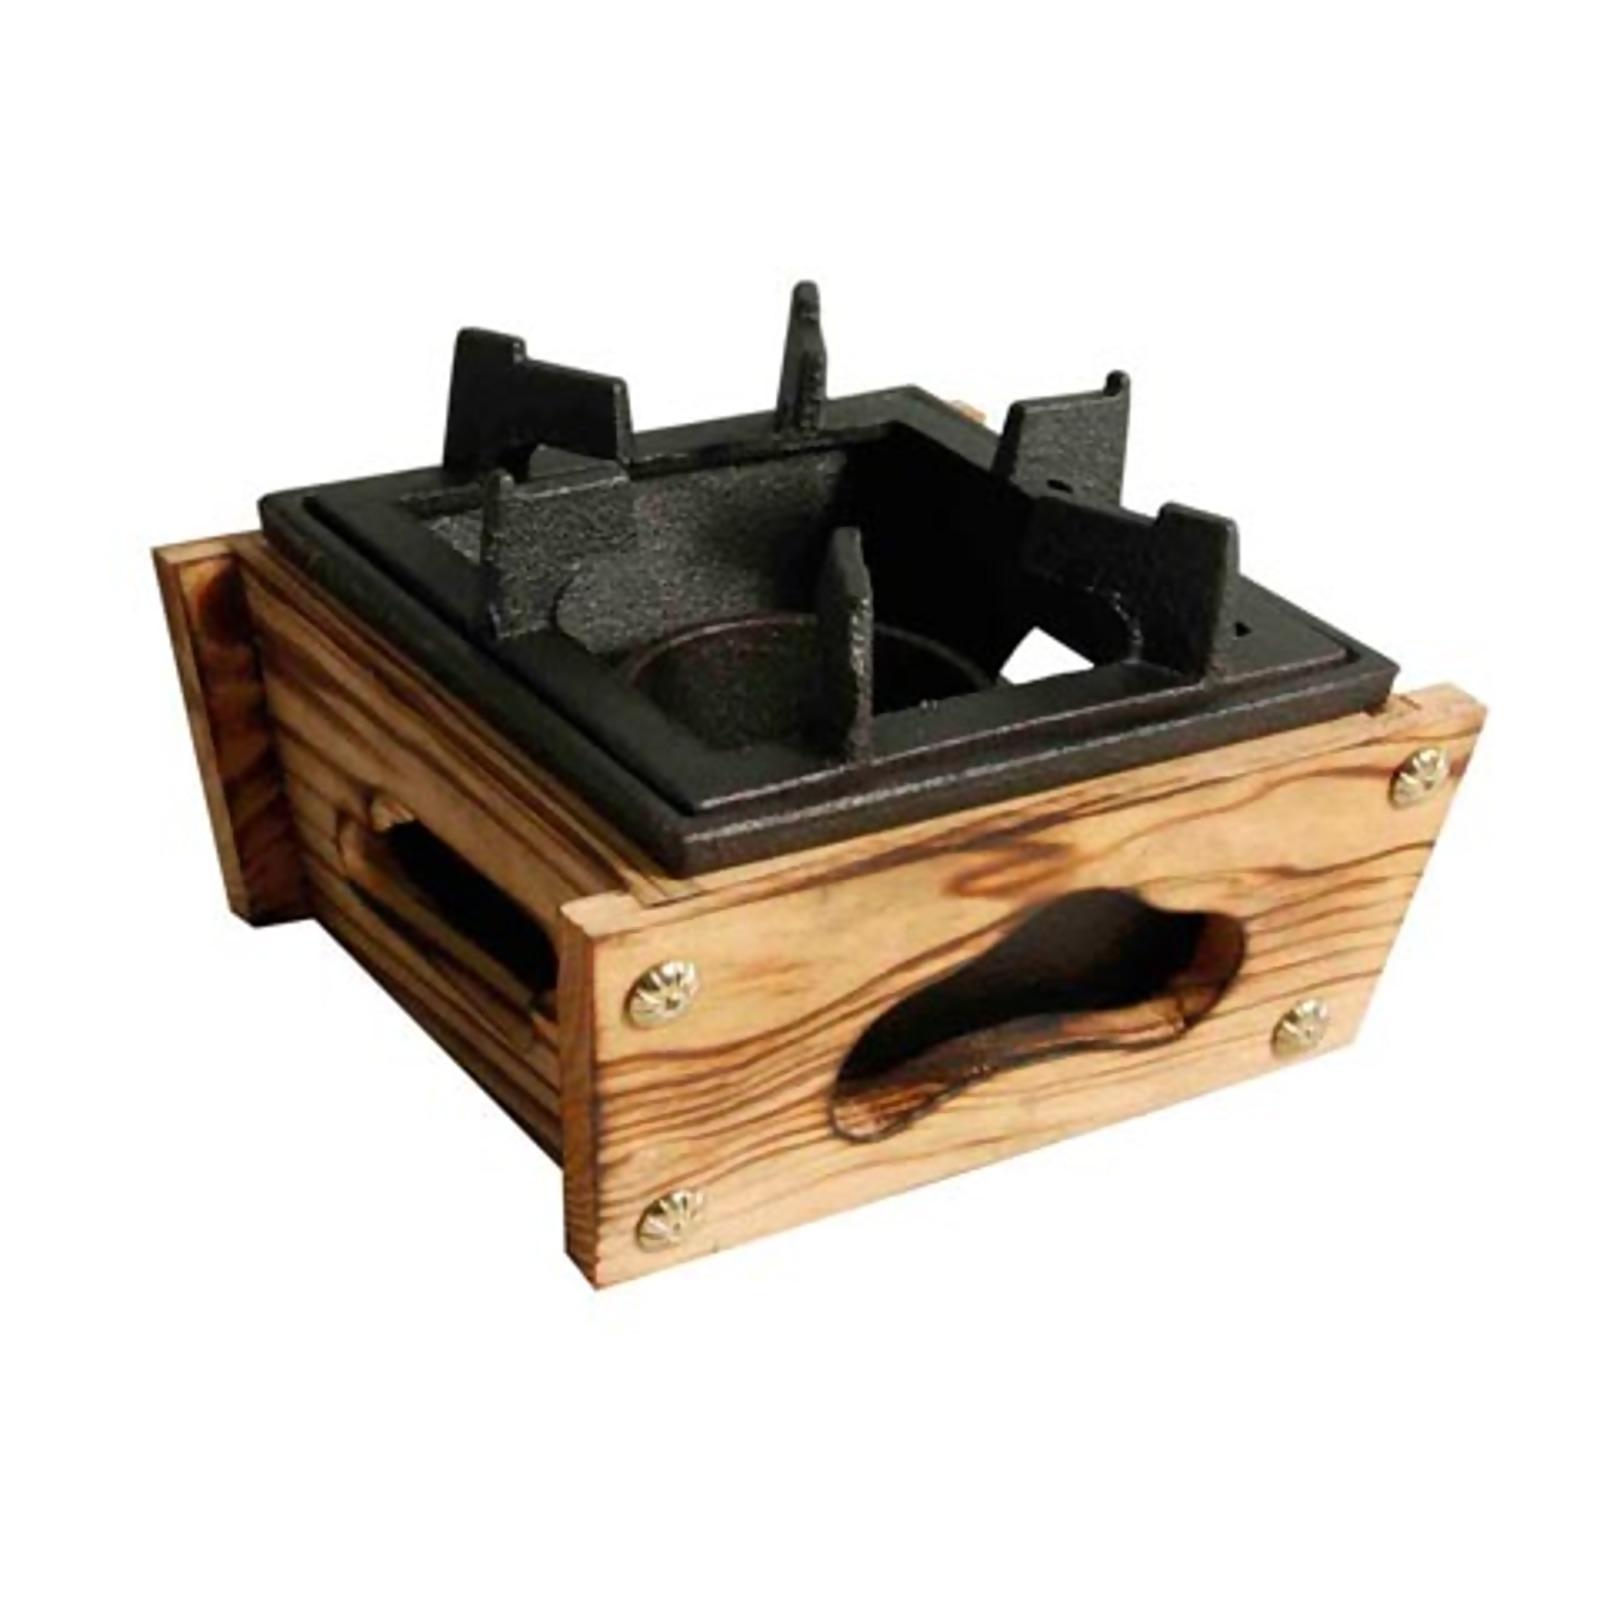 Square Cast Iron Stove 14Cm W/Wooden Base